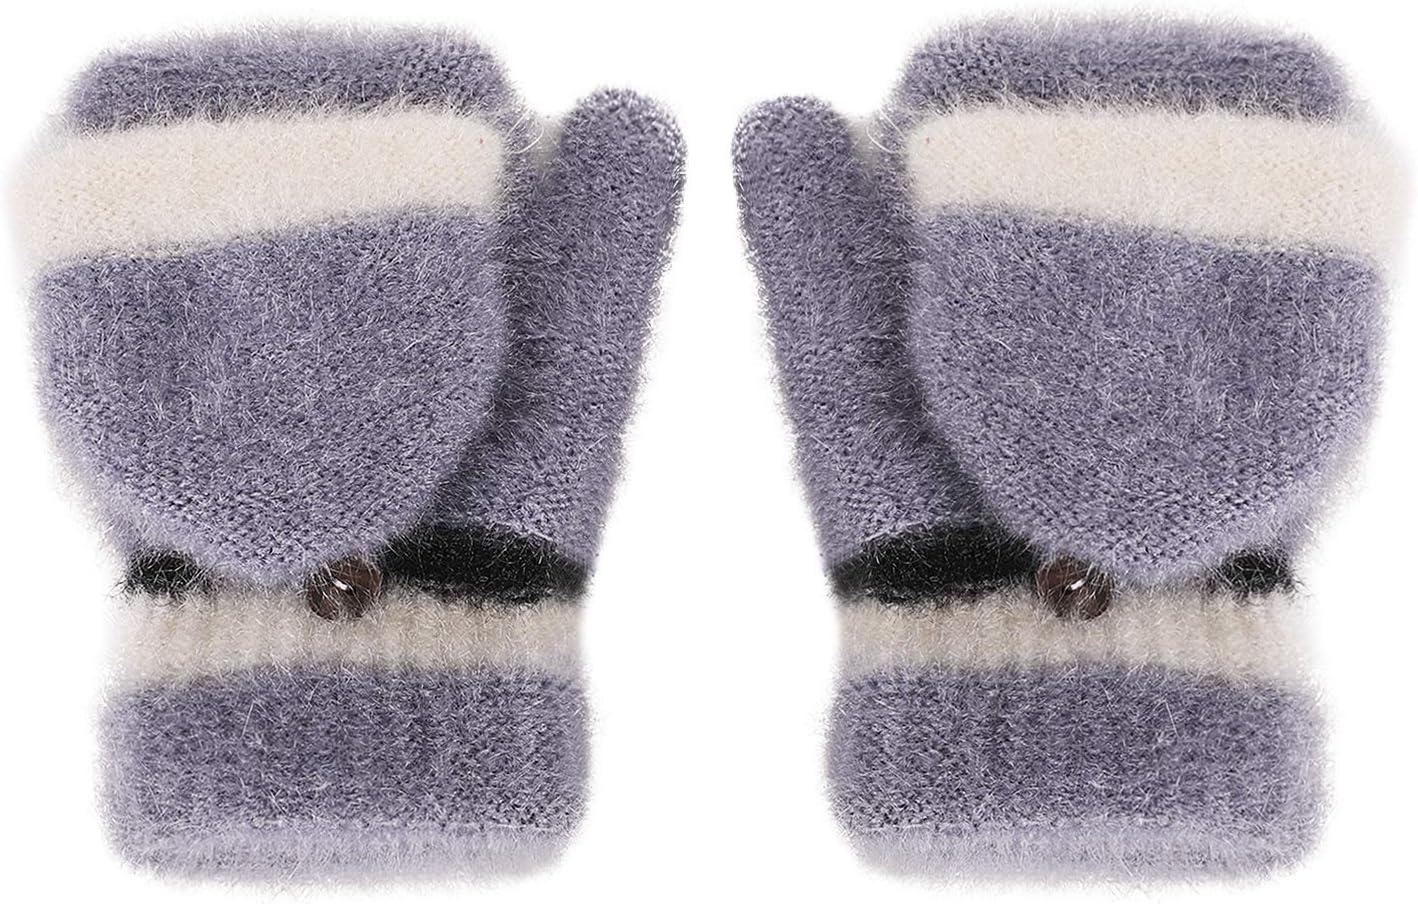 Women Girls Winter Half Finger Top Flip Gloves Faux Velvet Fingerless Mittens Thick Warm Convertible Gloves with Mitten Cover